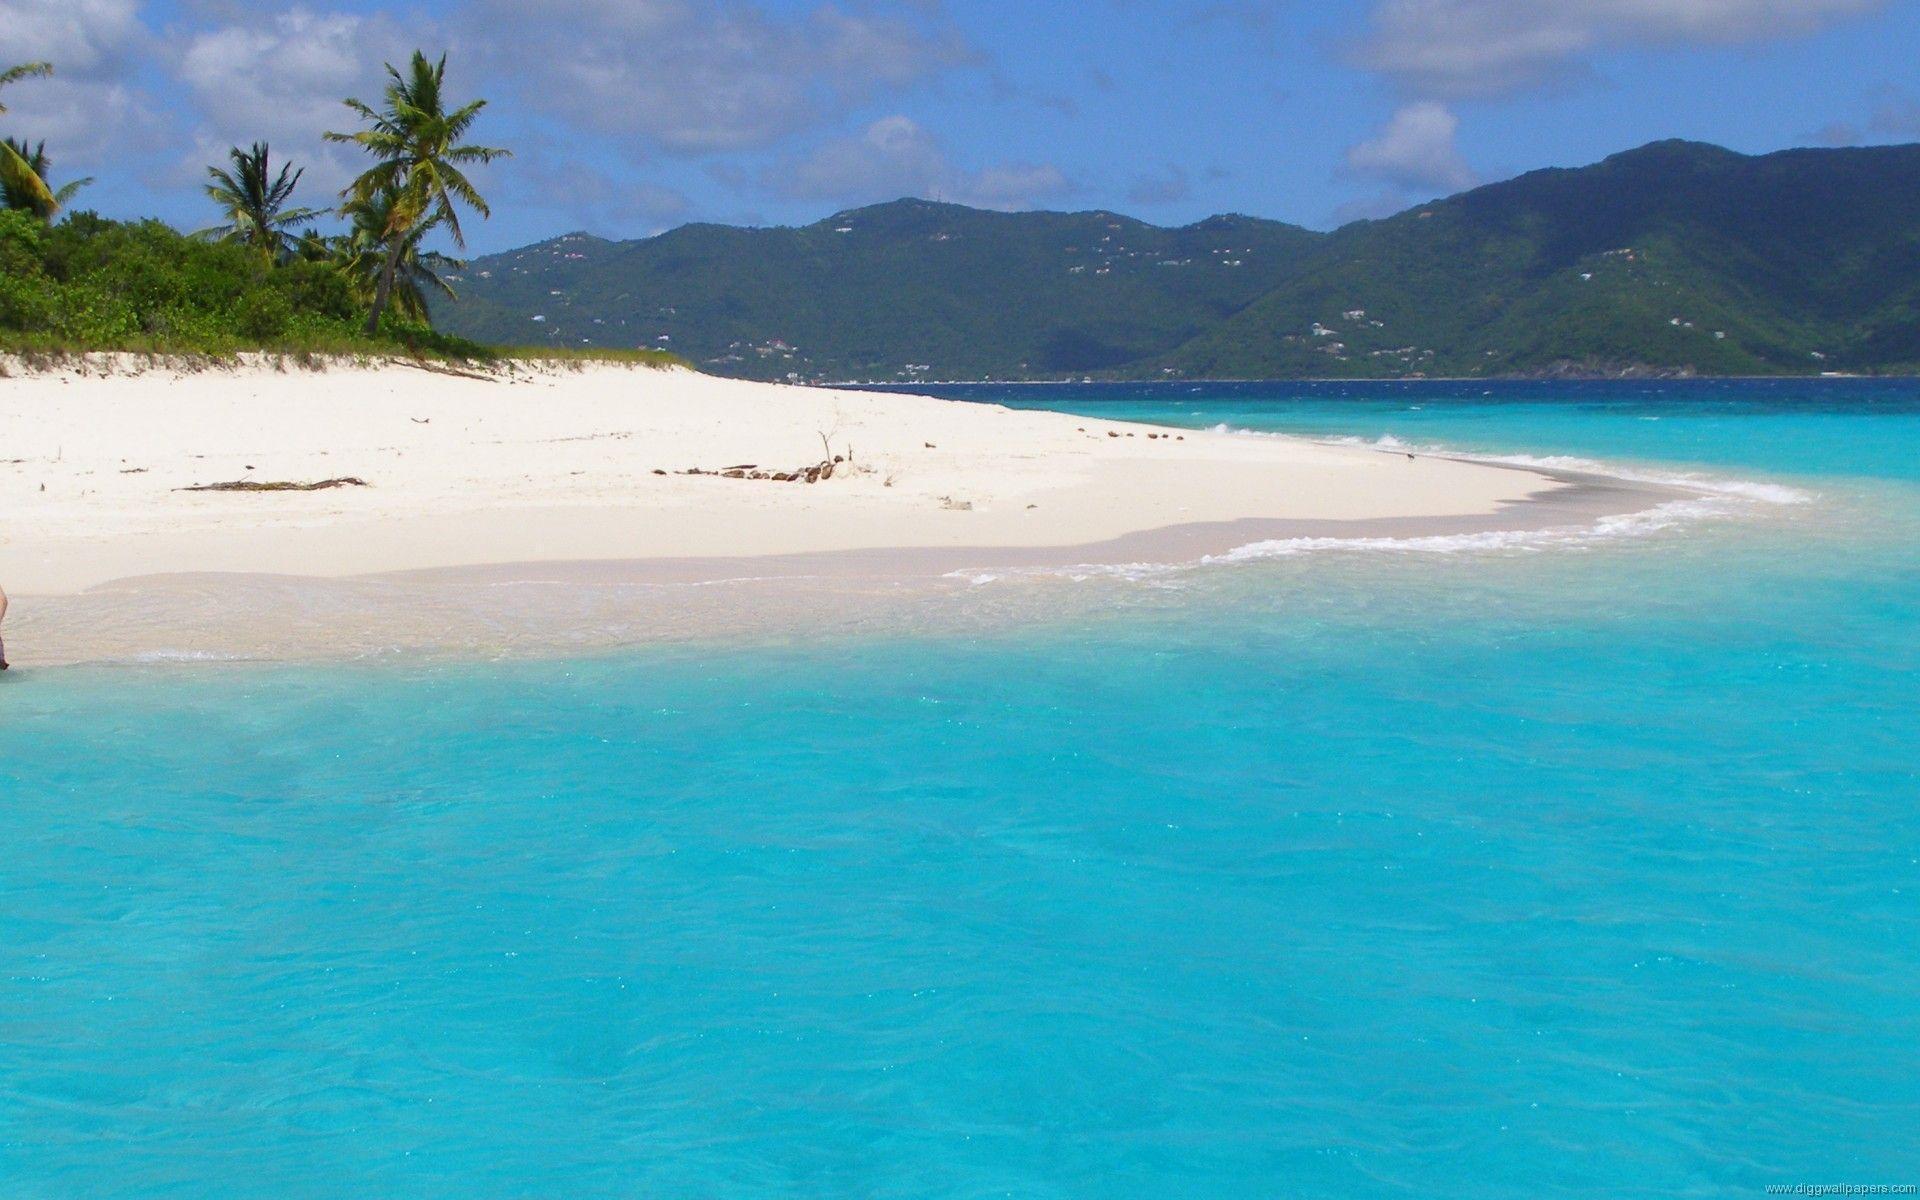 ocean beach desktop wallpapers free on latoro download oceans